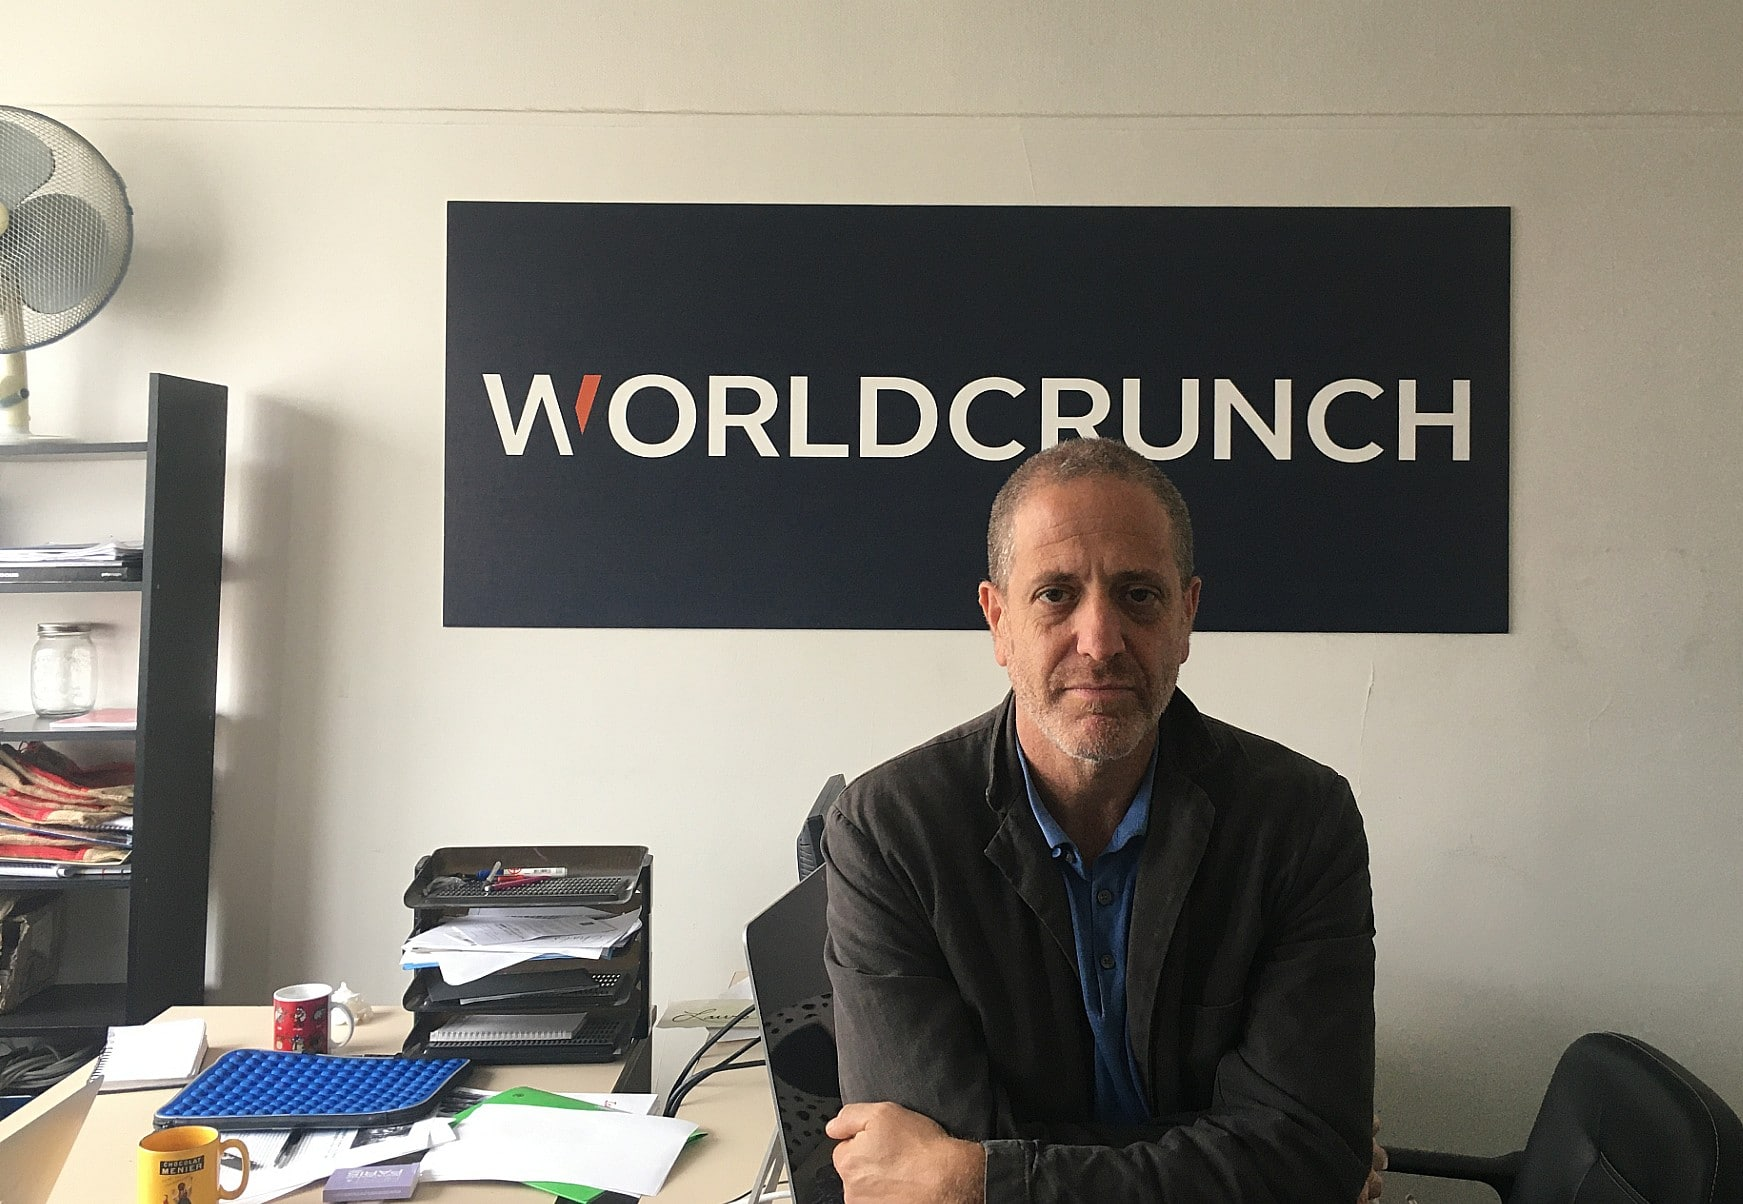 Jeff Israely Worldcrunch